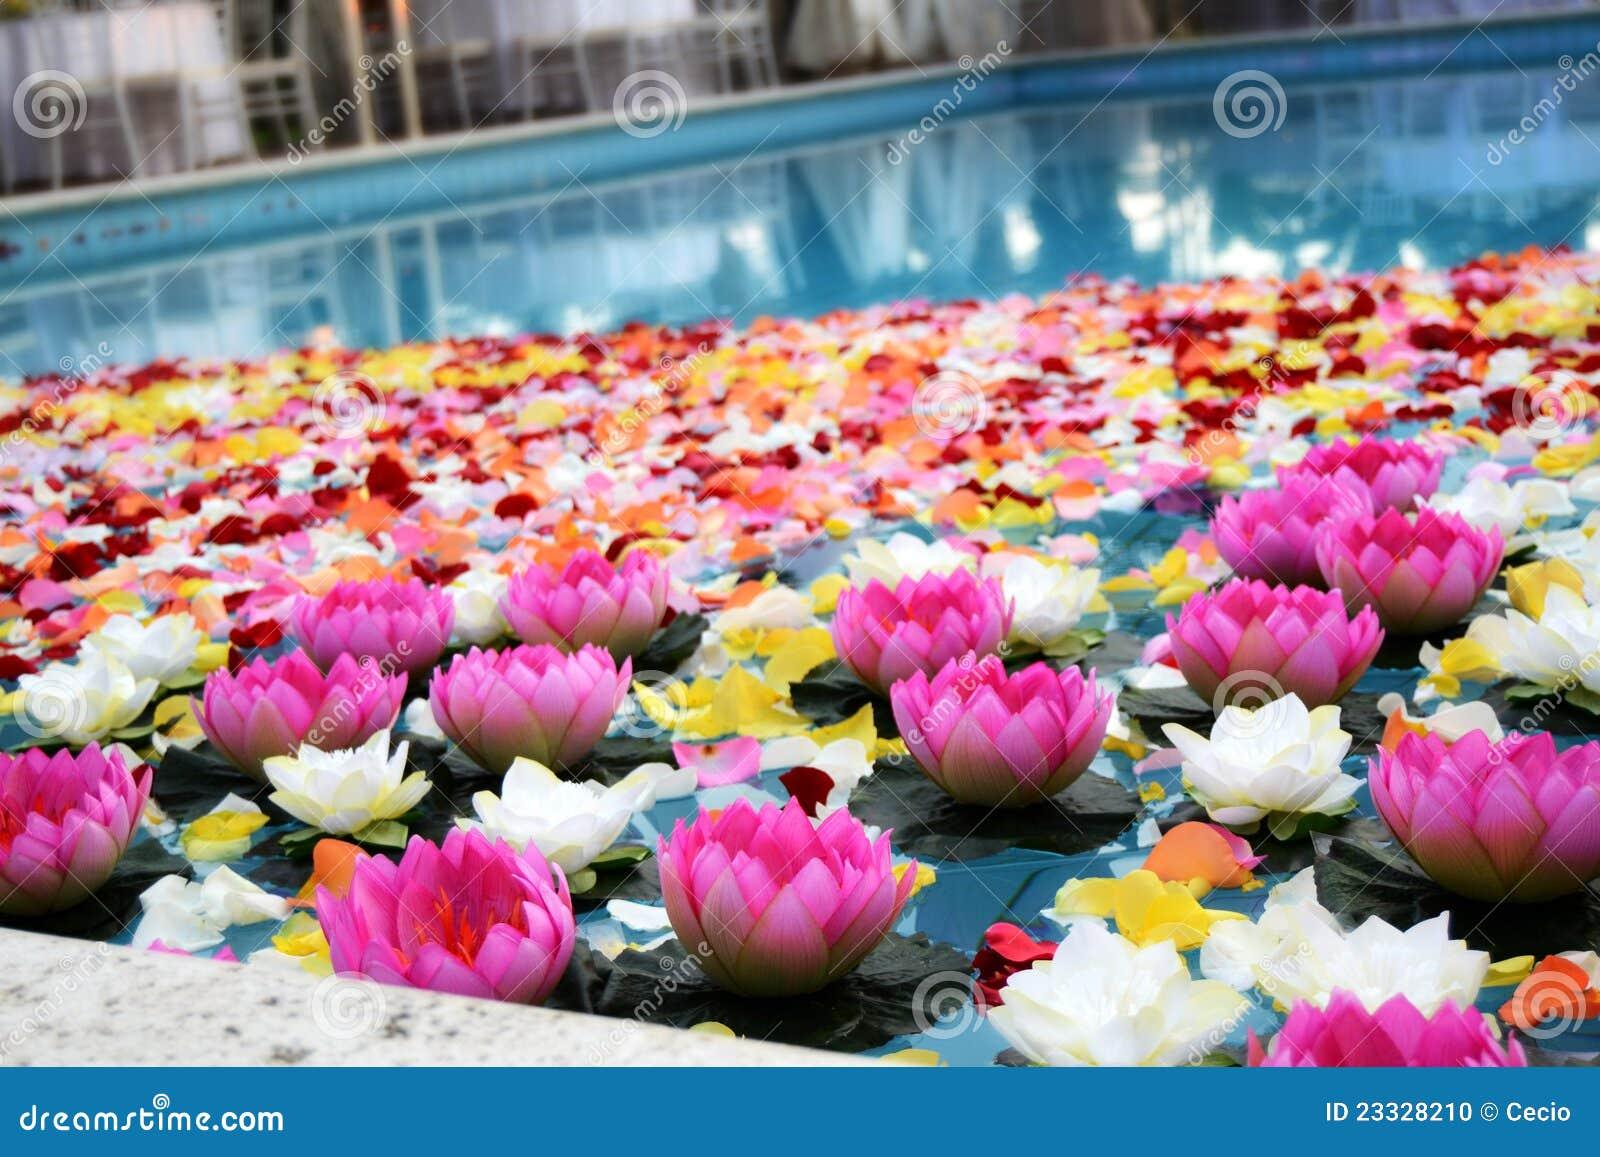 Pink Lotus Flowers in Pool stock photo. Image of display - 23328210